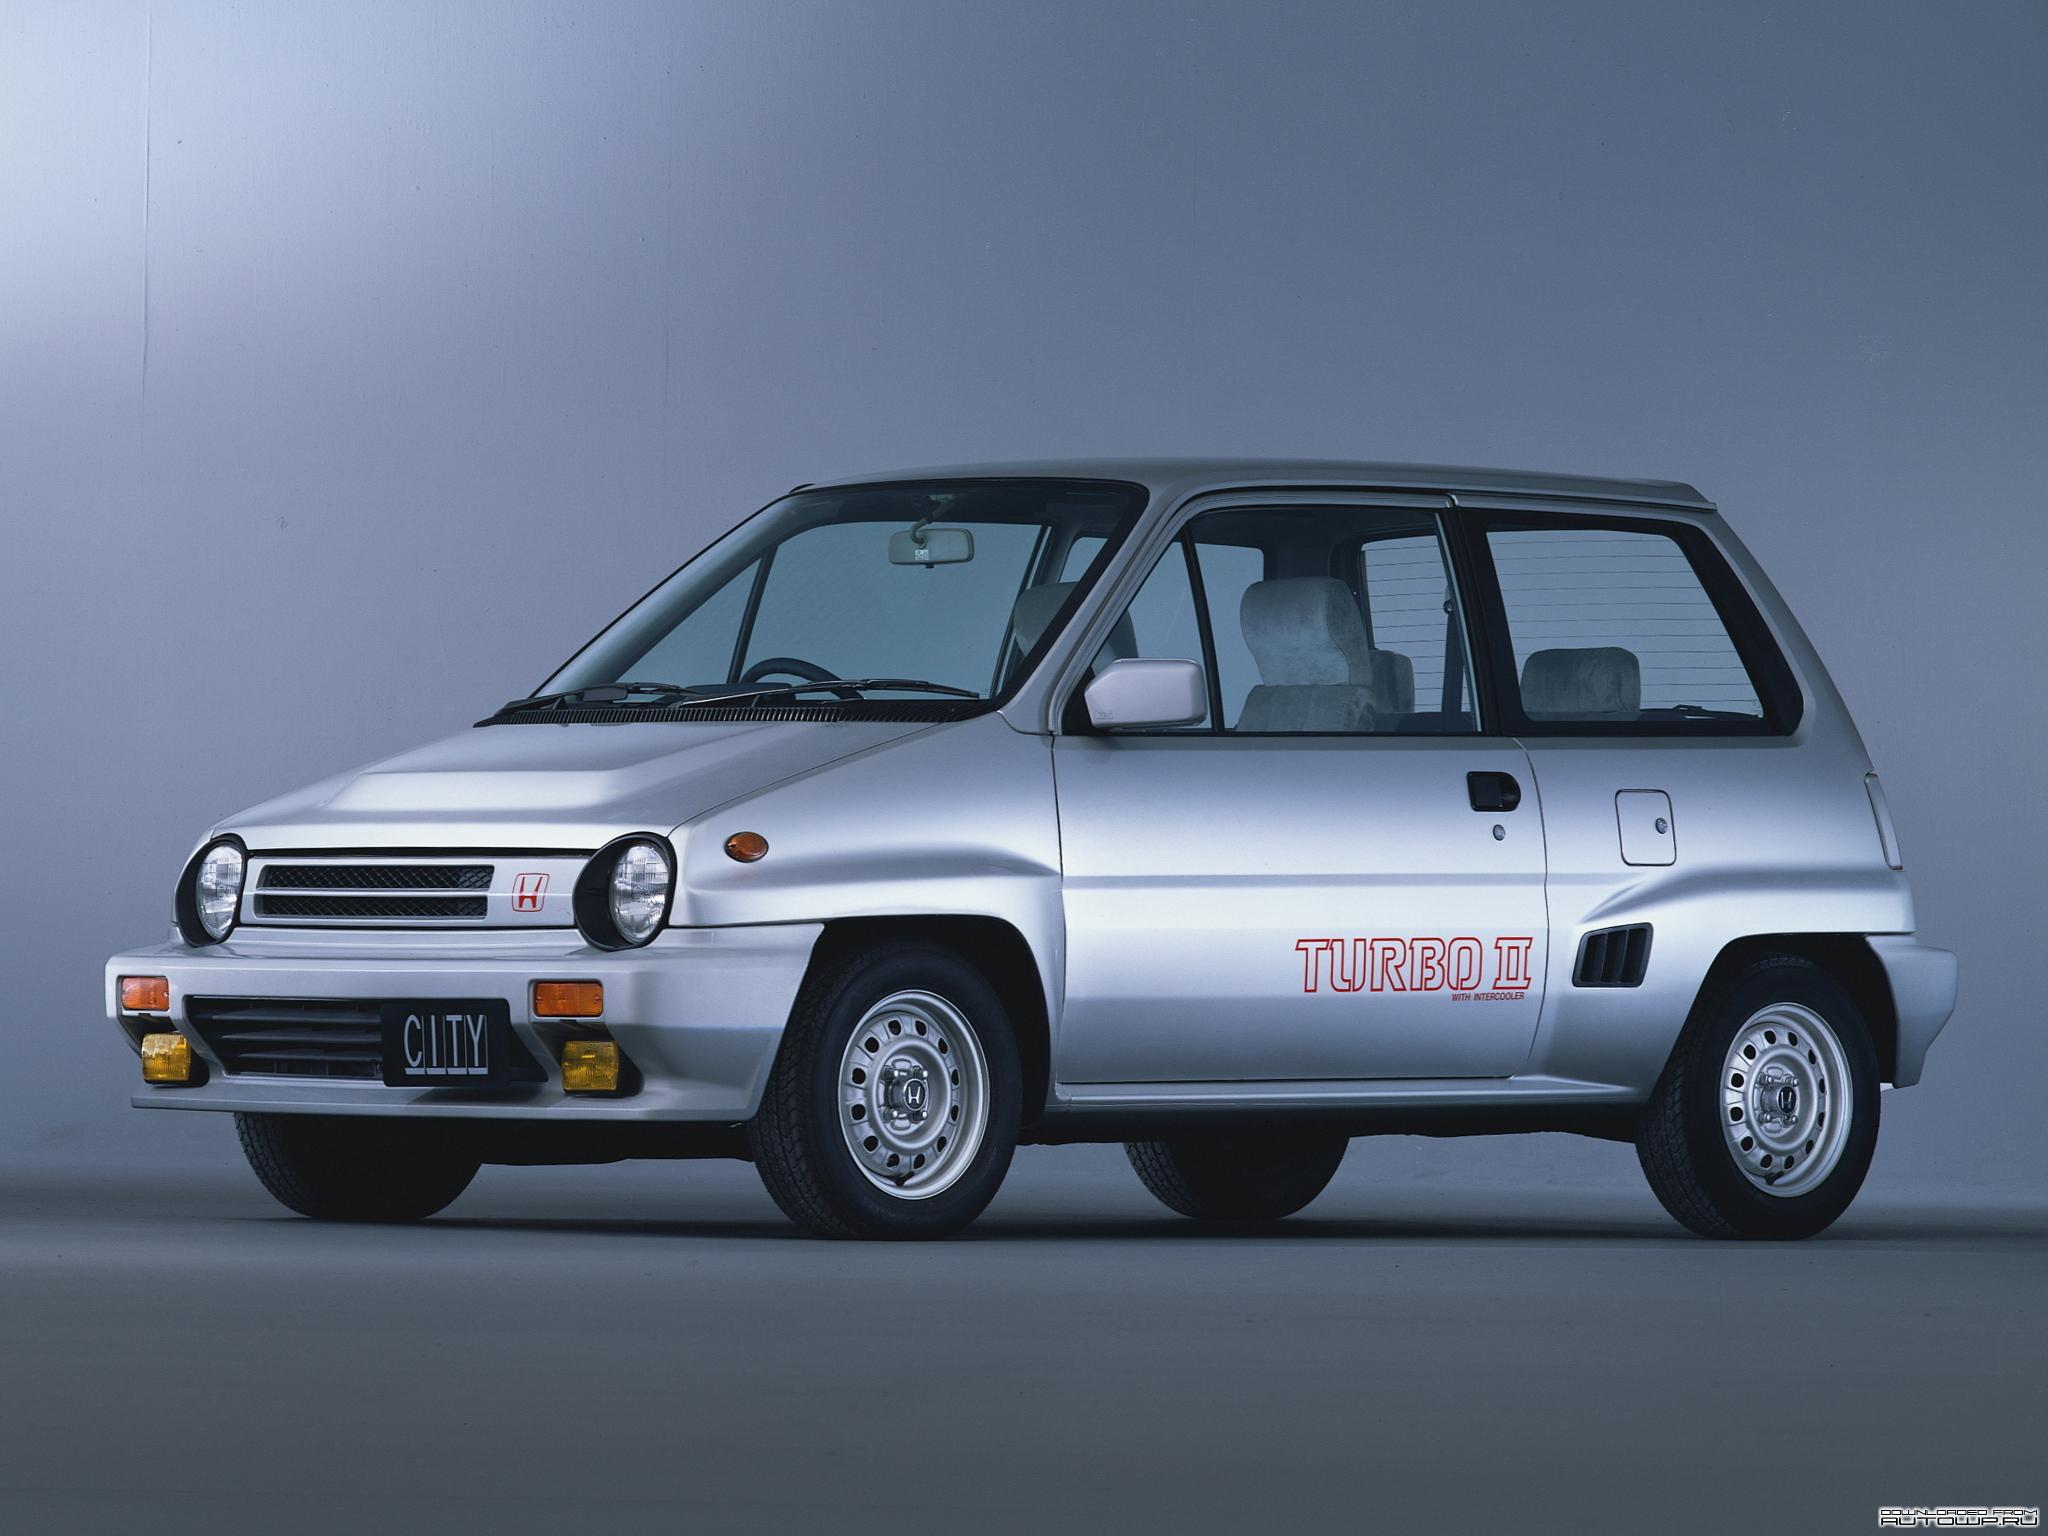 honda-city-turbo-ii-03.jpg